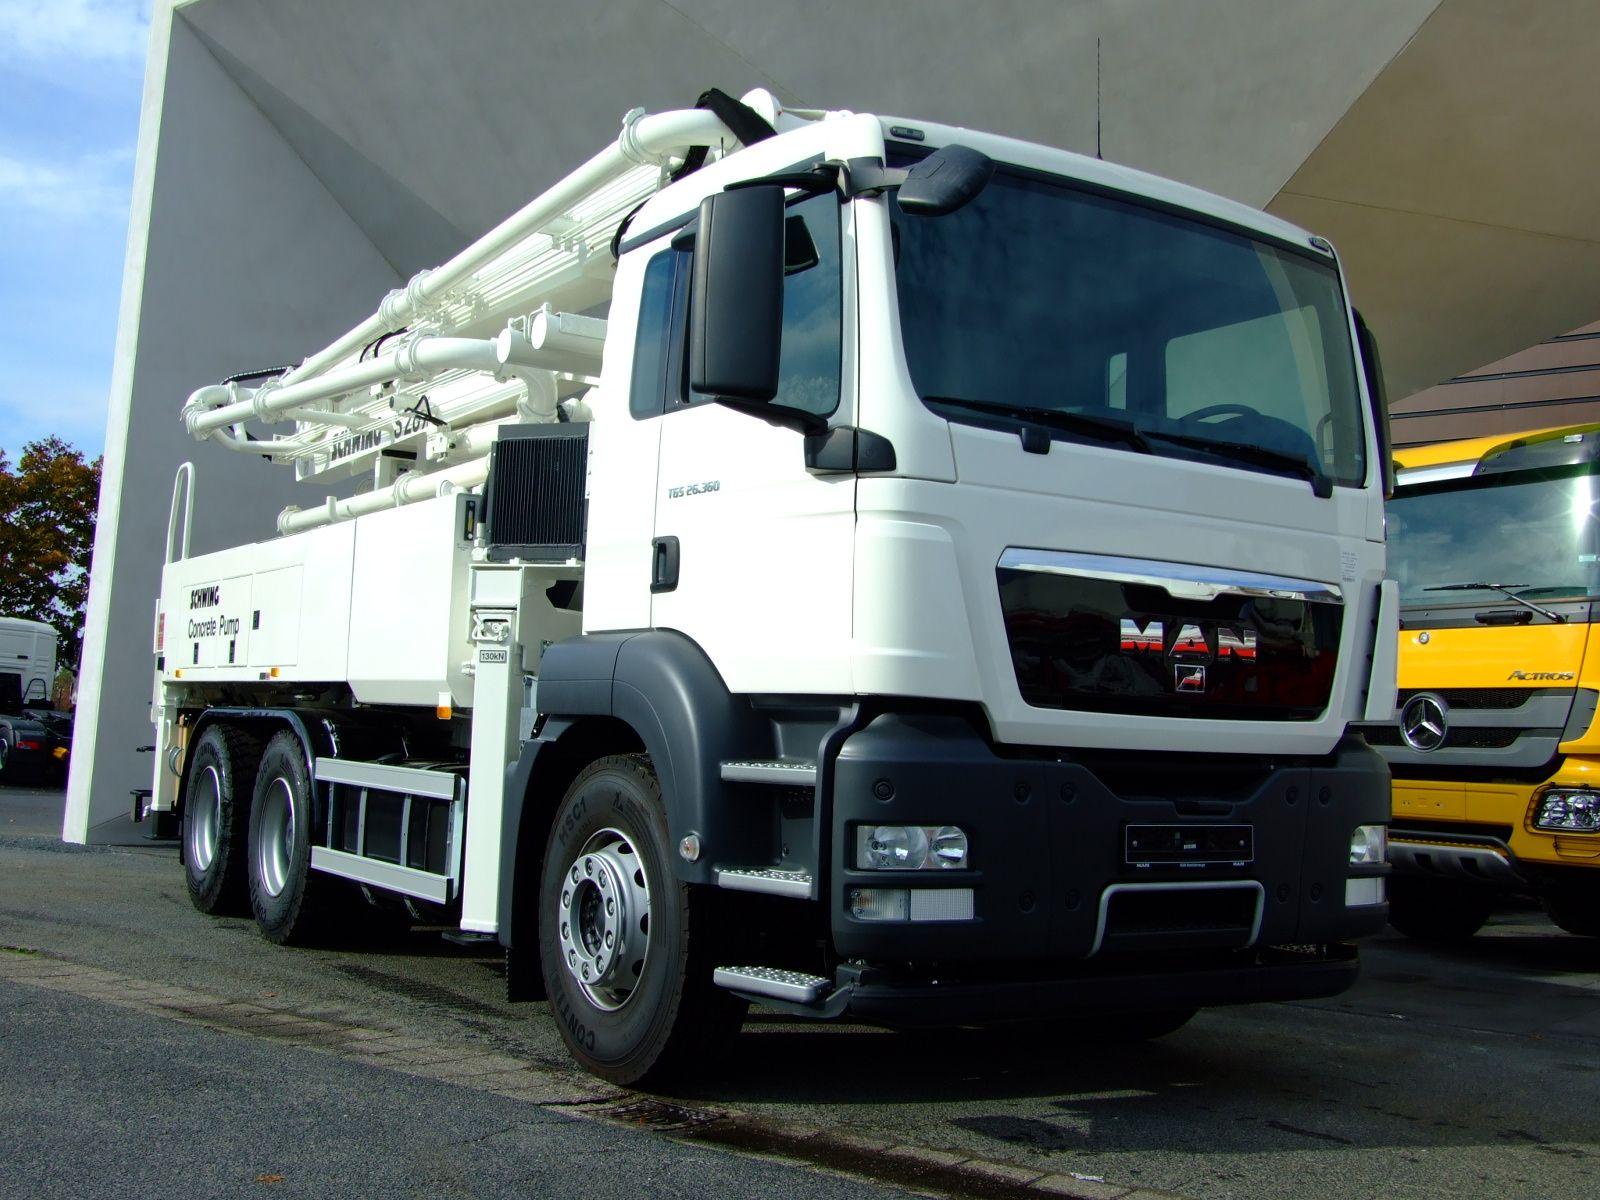 Man tgs 26 360 6x4 bb schwing s28x concrete pump truck over 7 5t concrete pump new vehicle 500 km diesel 265 kw 360 hp manual gearbox permissible gross